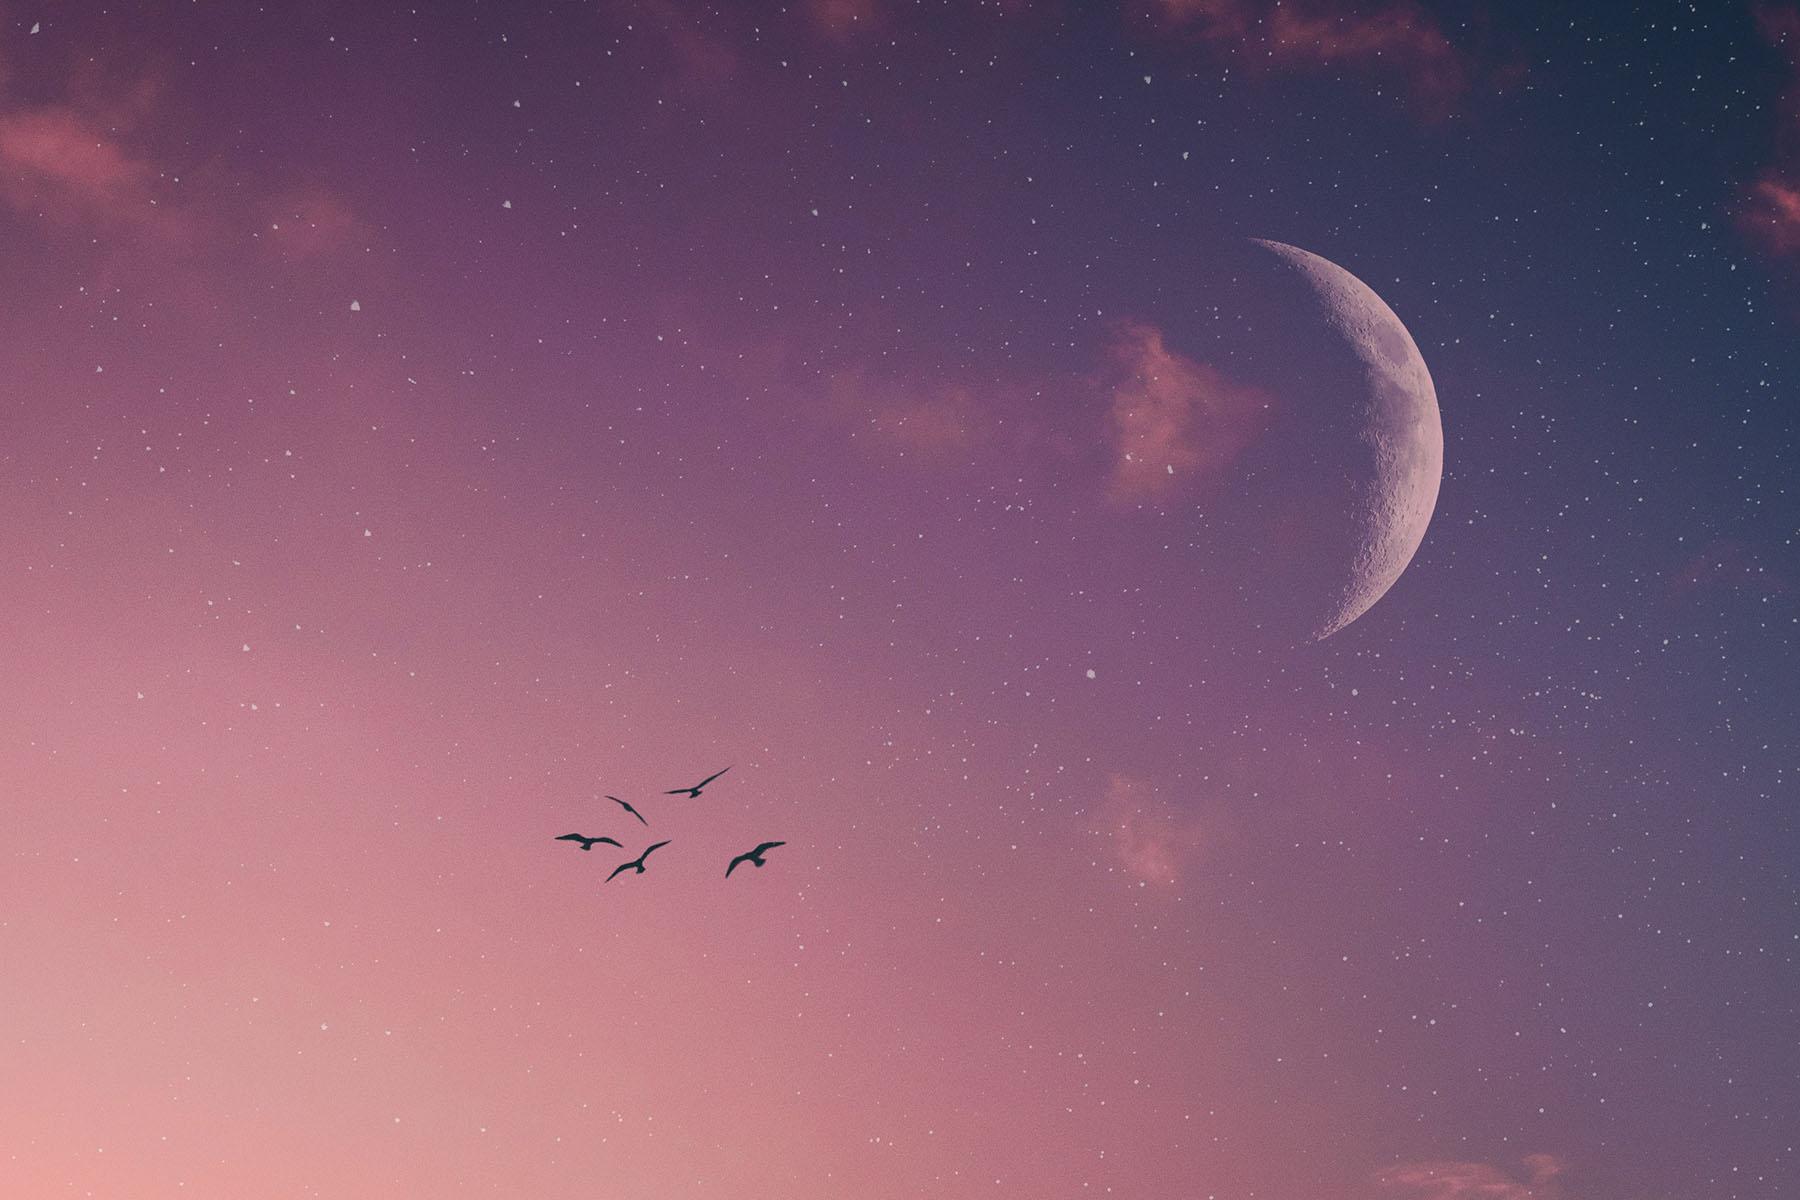 February 2020 New Moon in Pisces Horoscopes